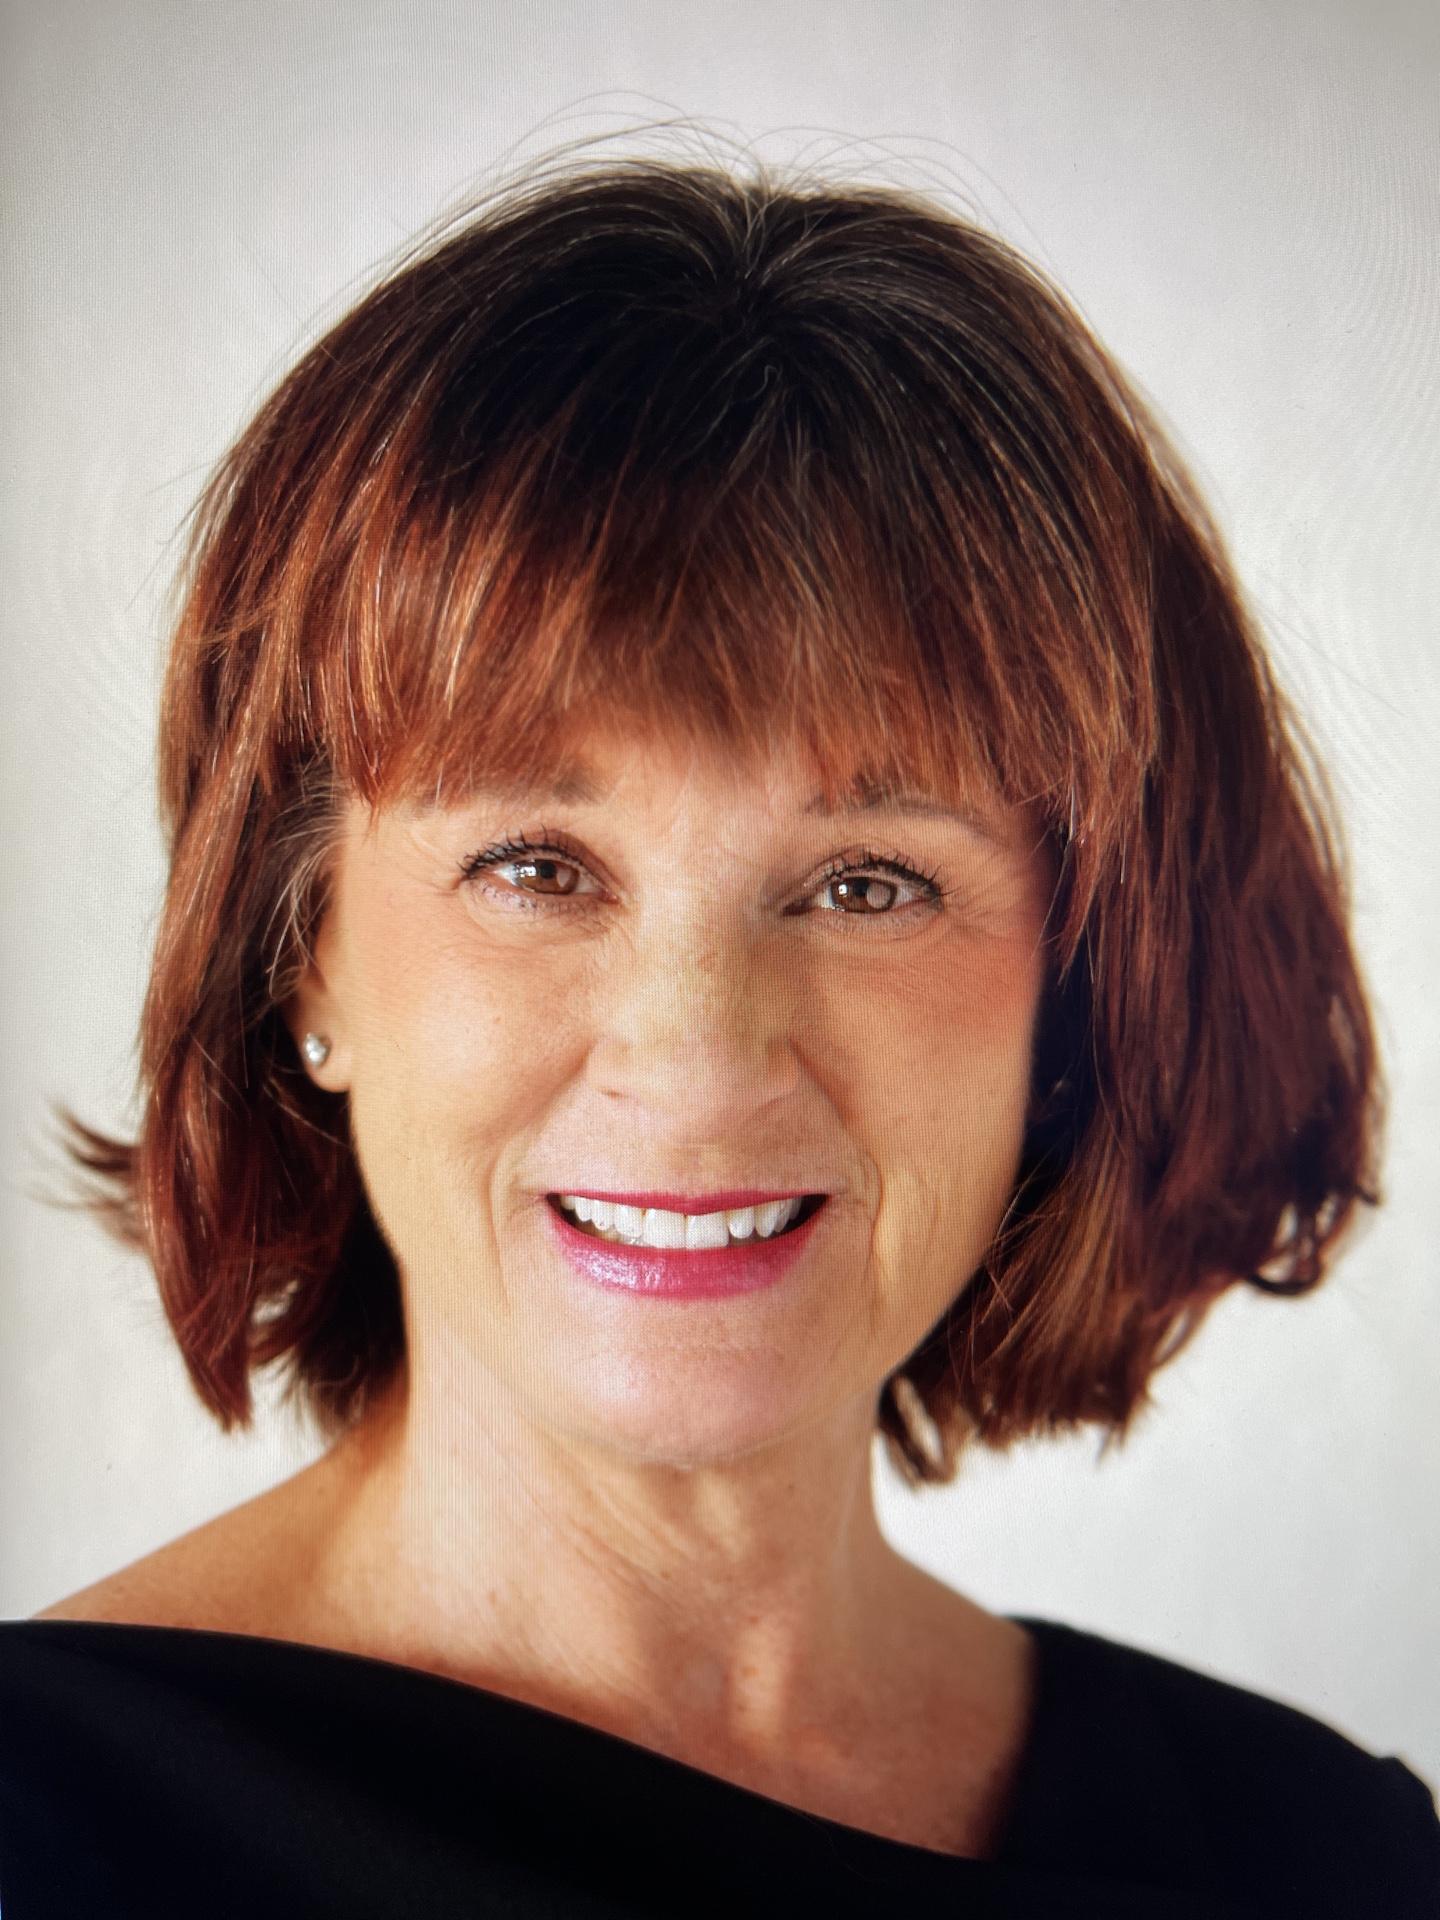 Denise undefined Stanton